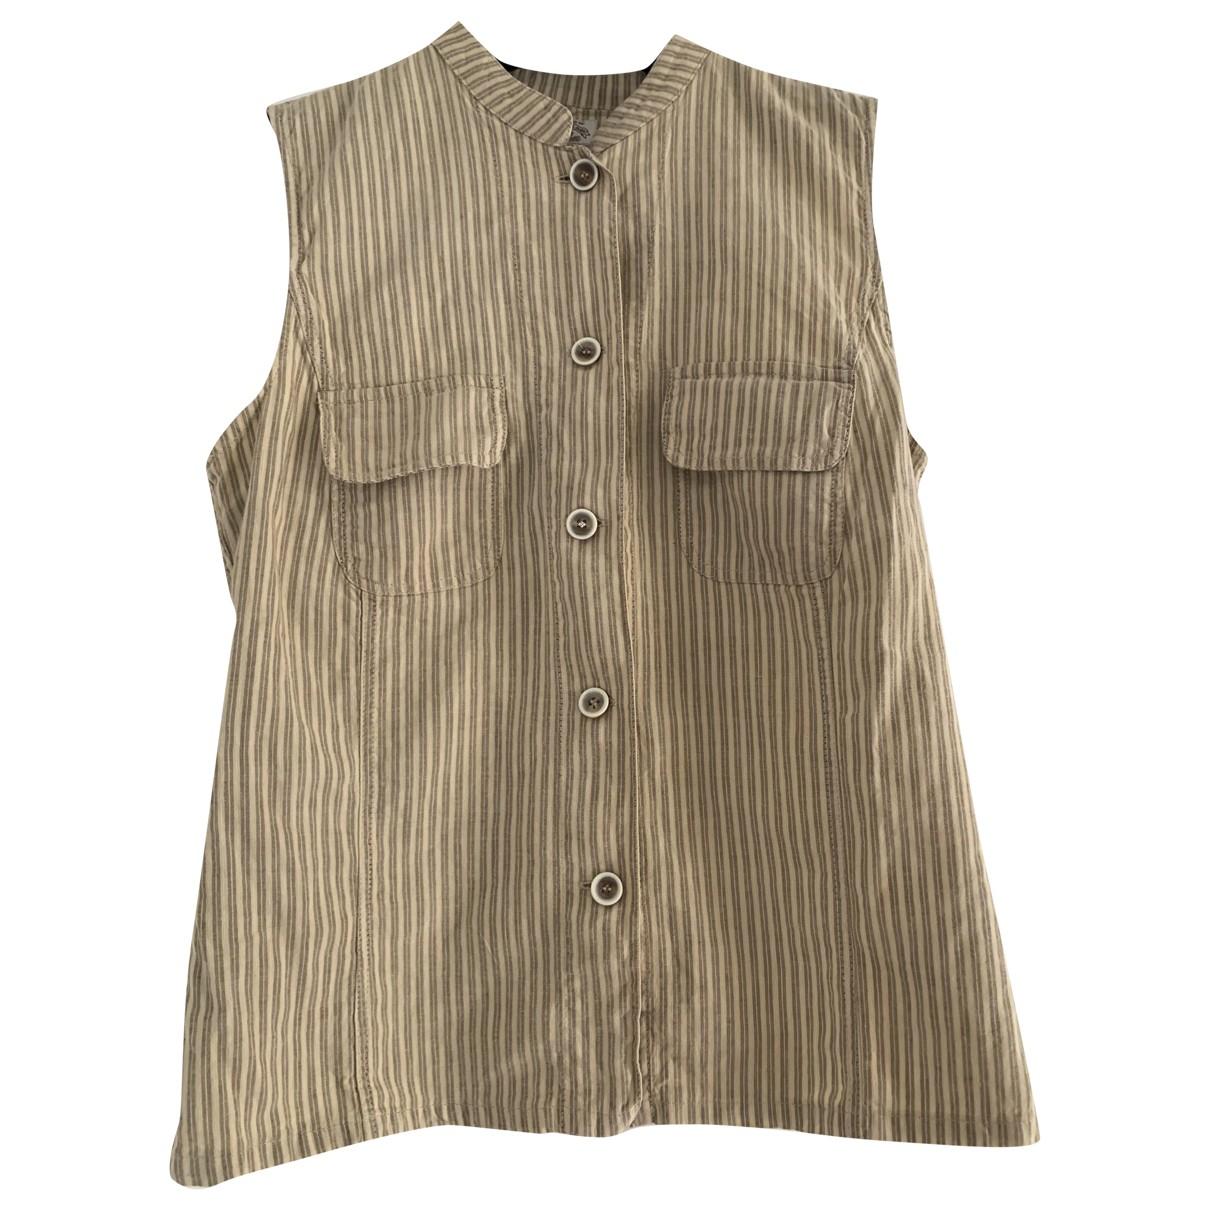 Camiseta sin mangas de Lino Emporio Armani